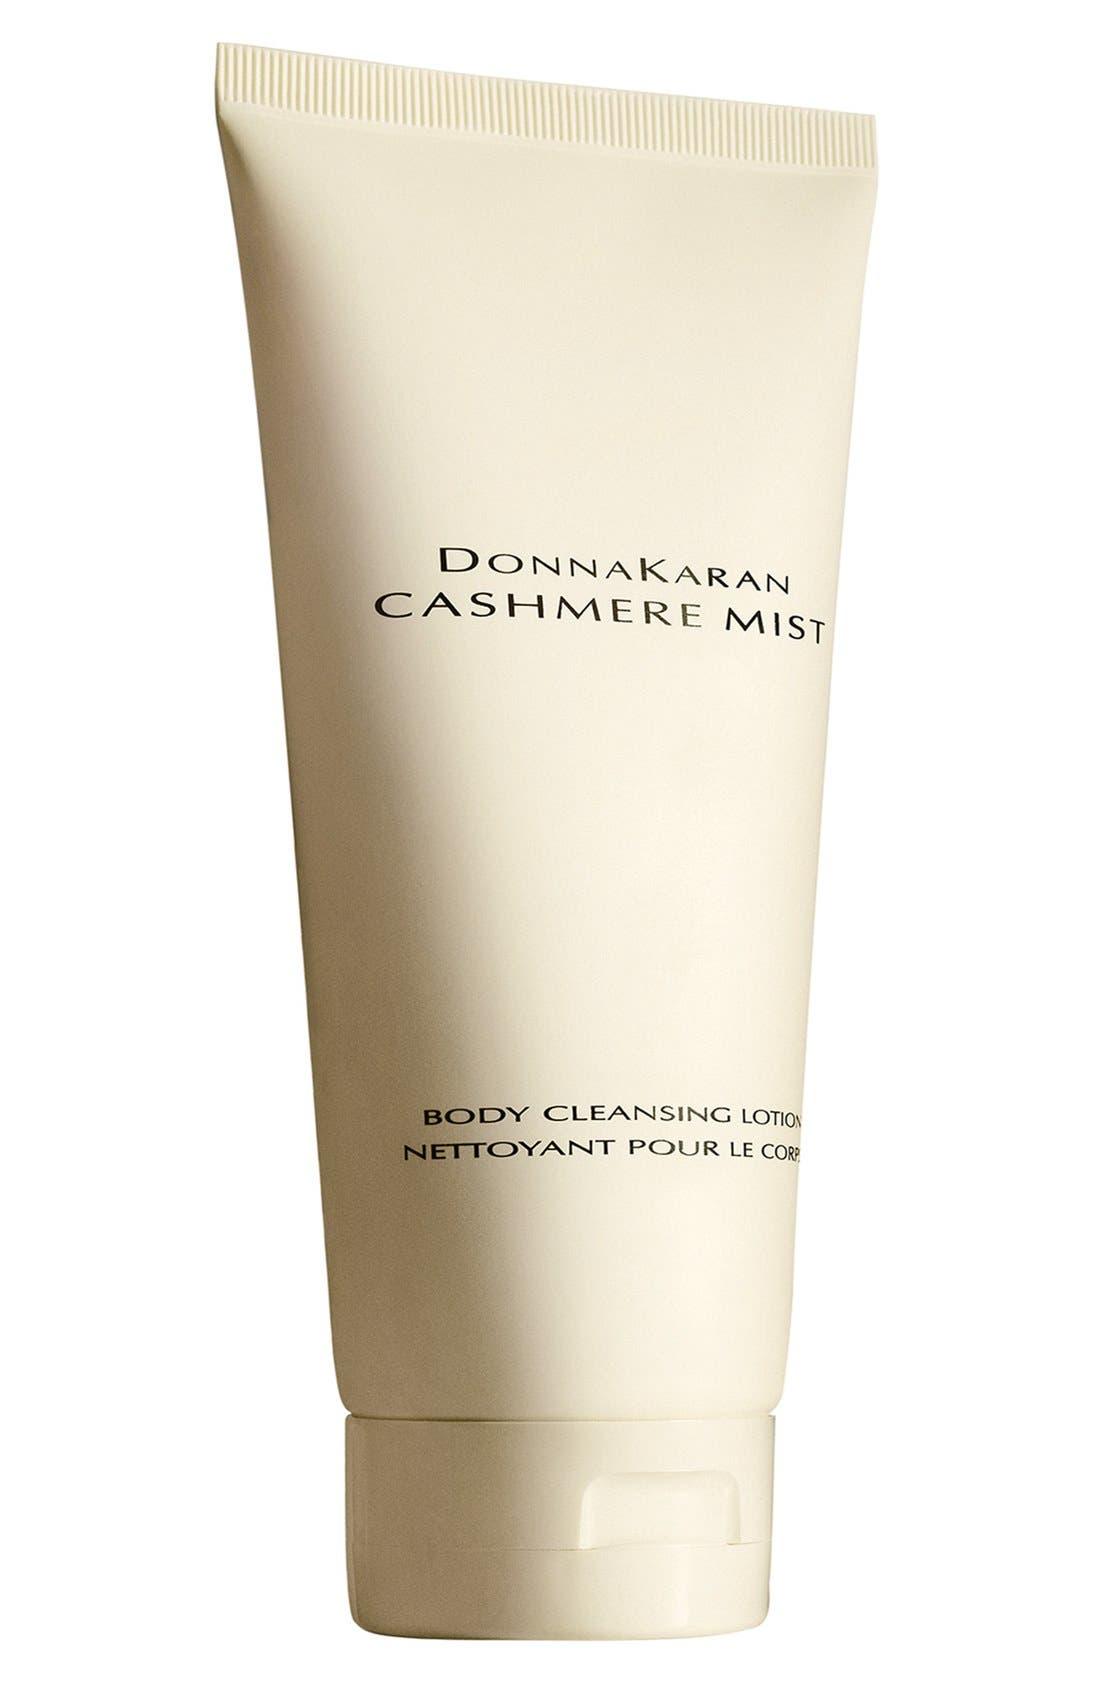 Donna Karan 'Cashmere Mist' Body Cleansing Lotion